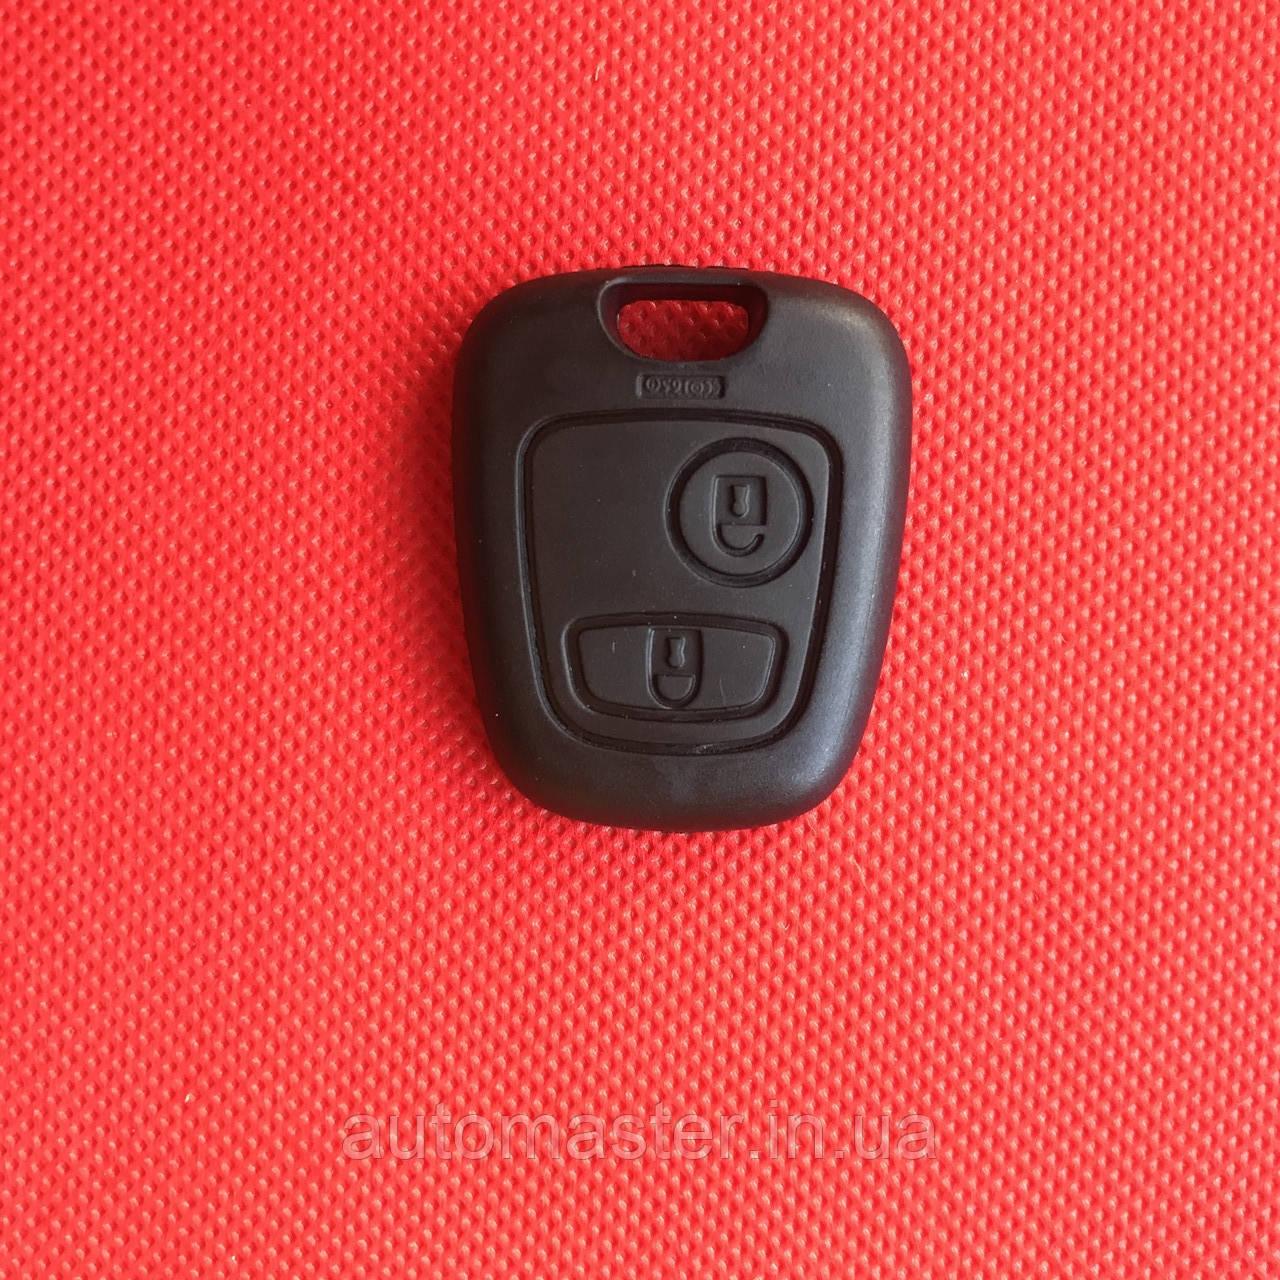 Крышка Корпуса авто ключа для PEUGEOT (Пежо)  2 - кнопки